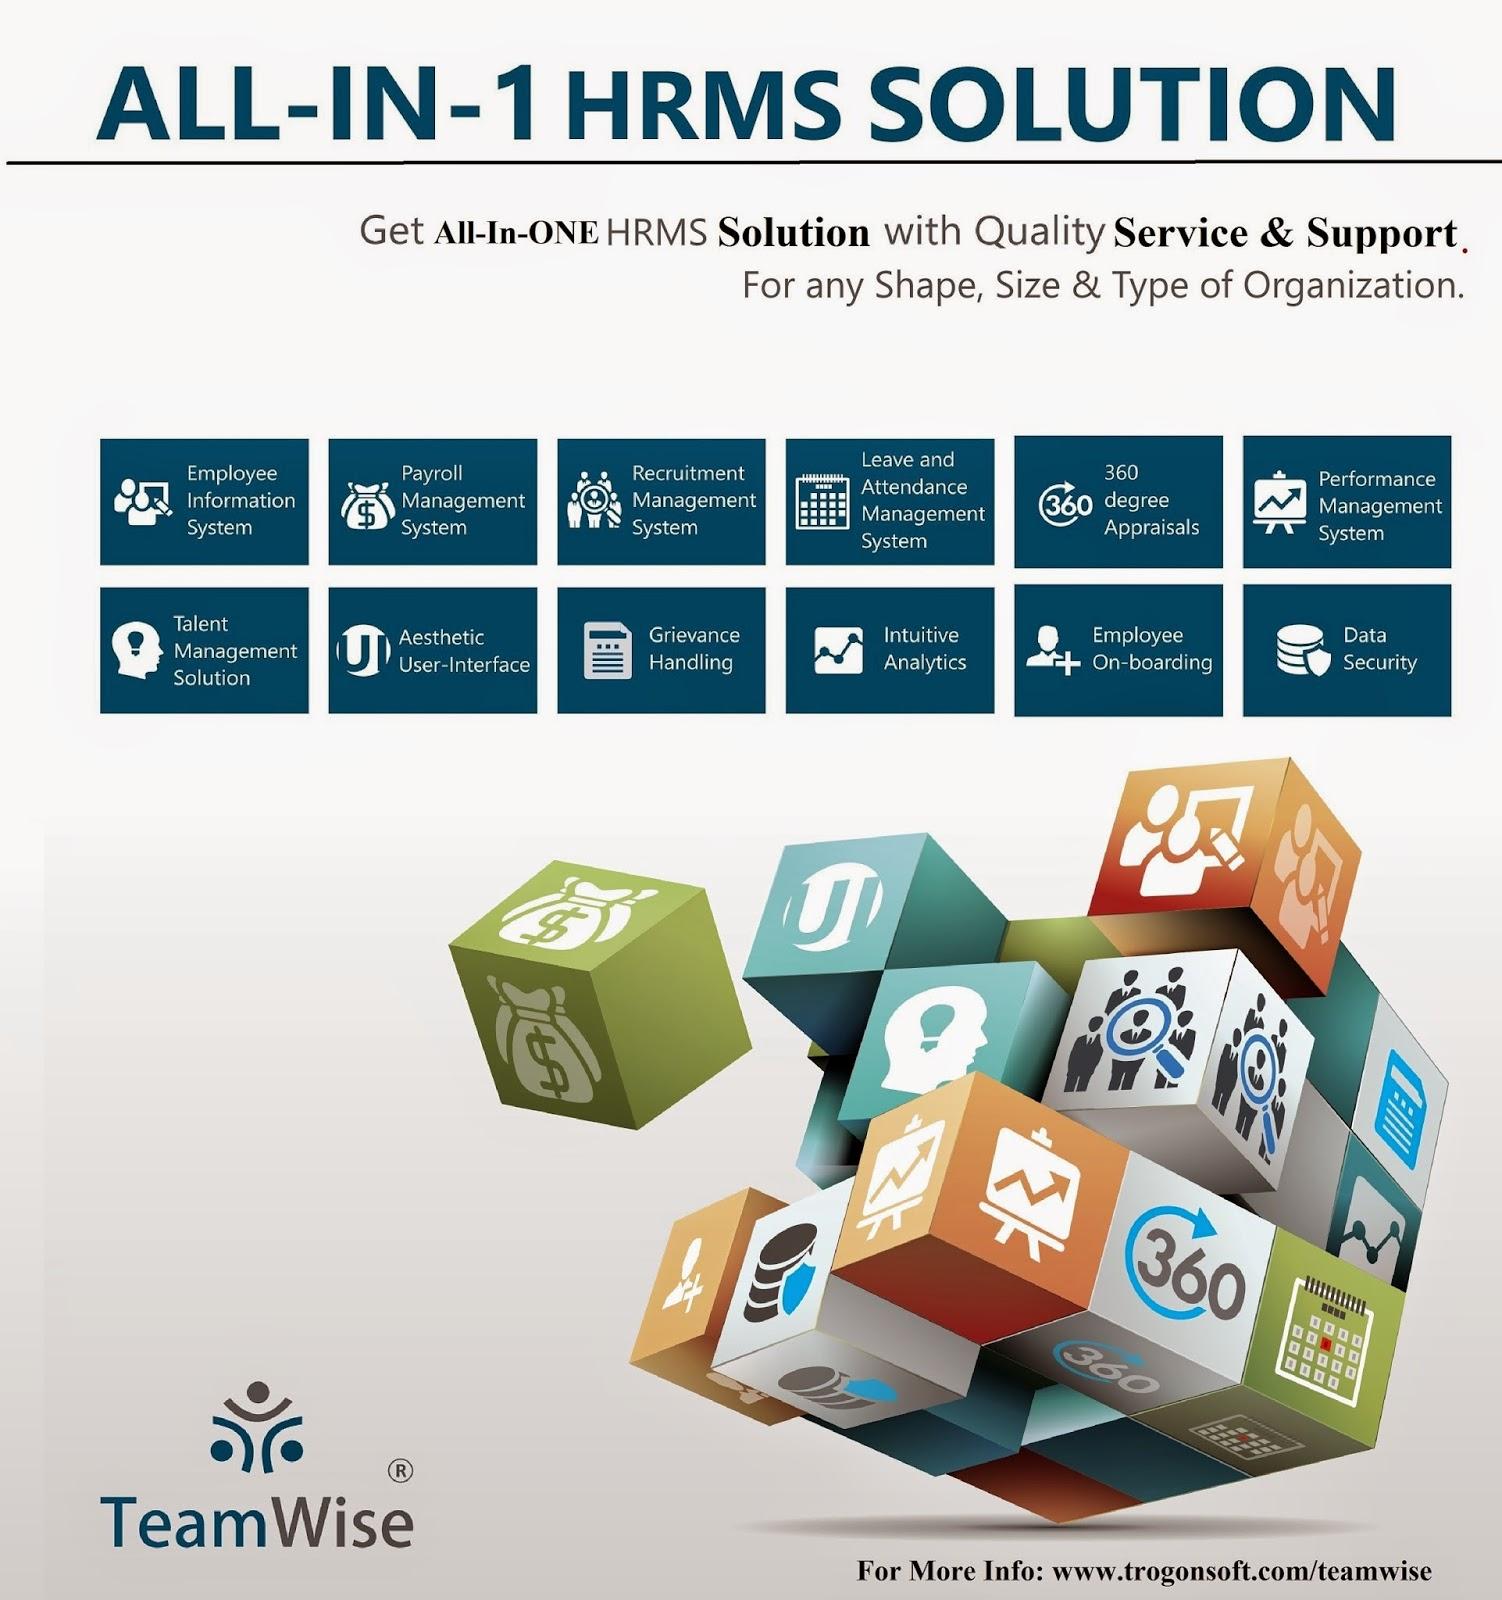 Employee Relationship Management (ERM) through Information System